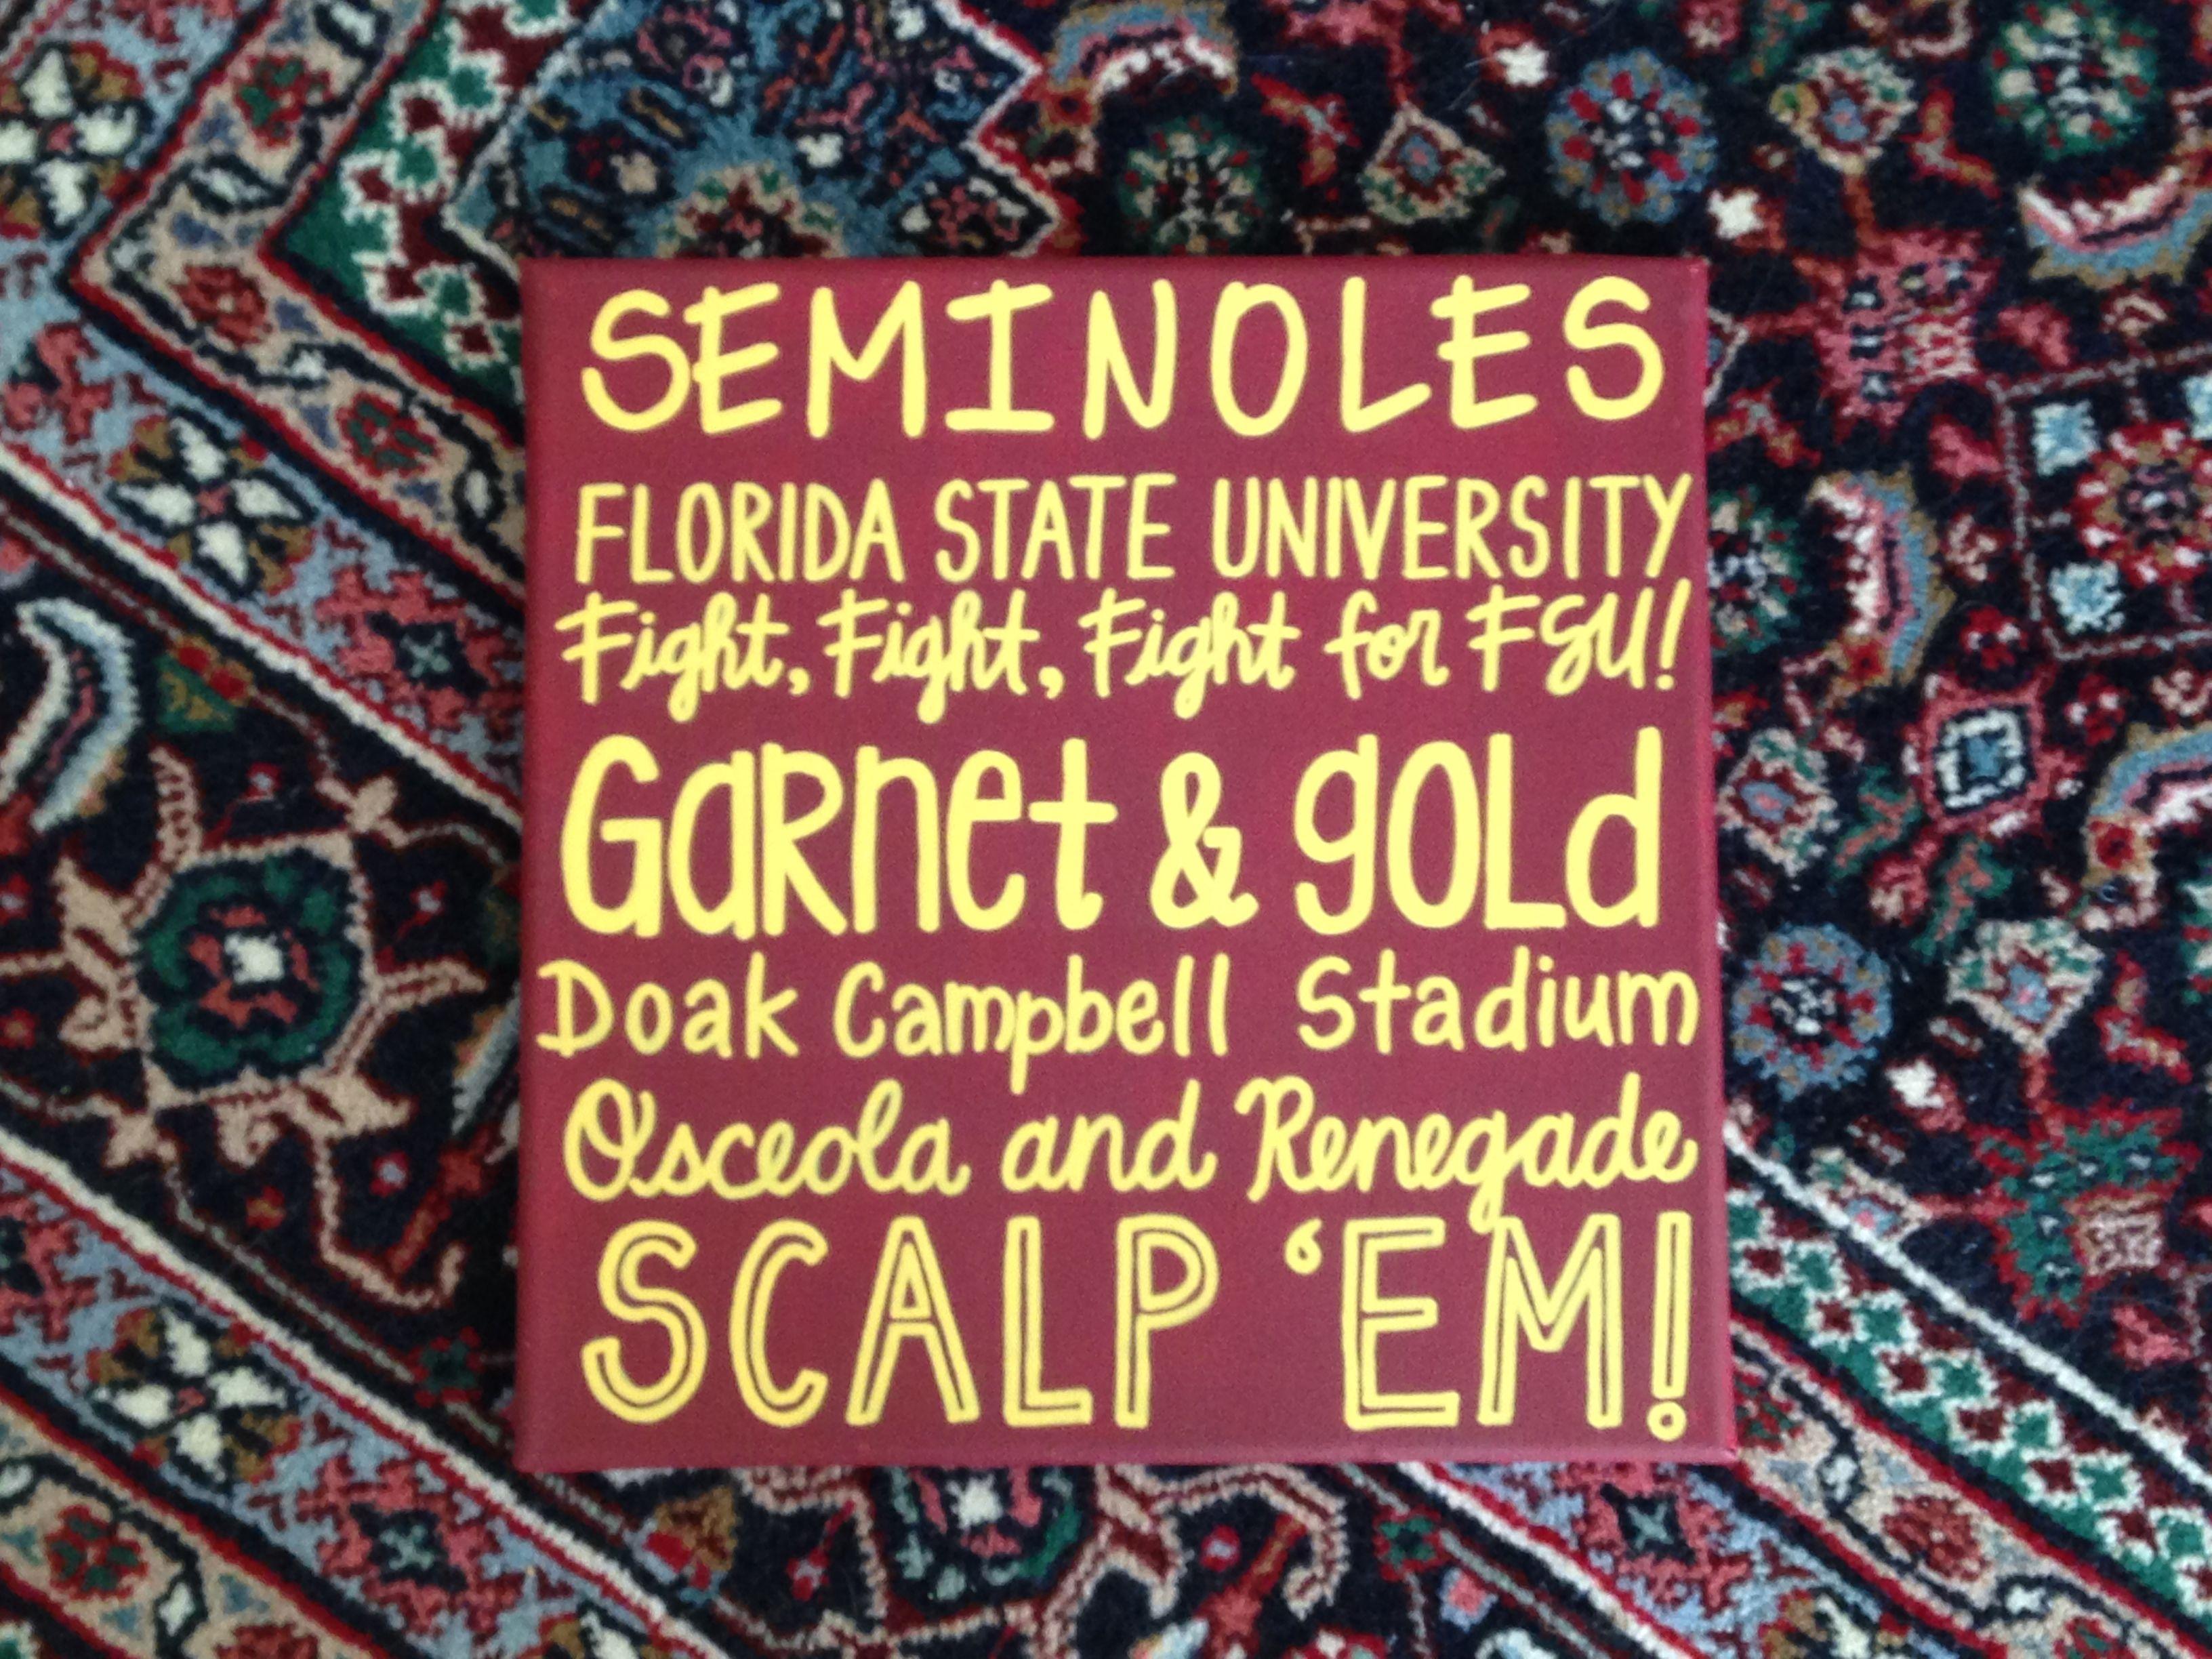 FSU Hand Painted Canvas 12x12 - GO NOLES! | Florida State